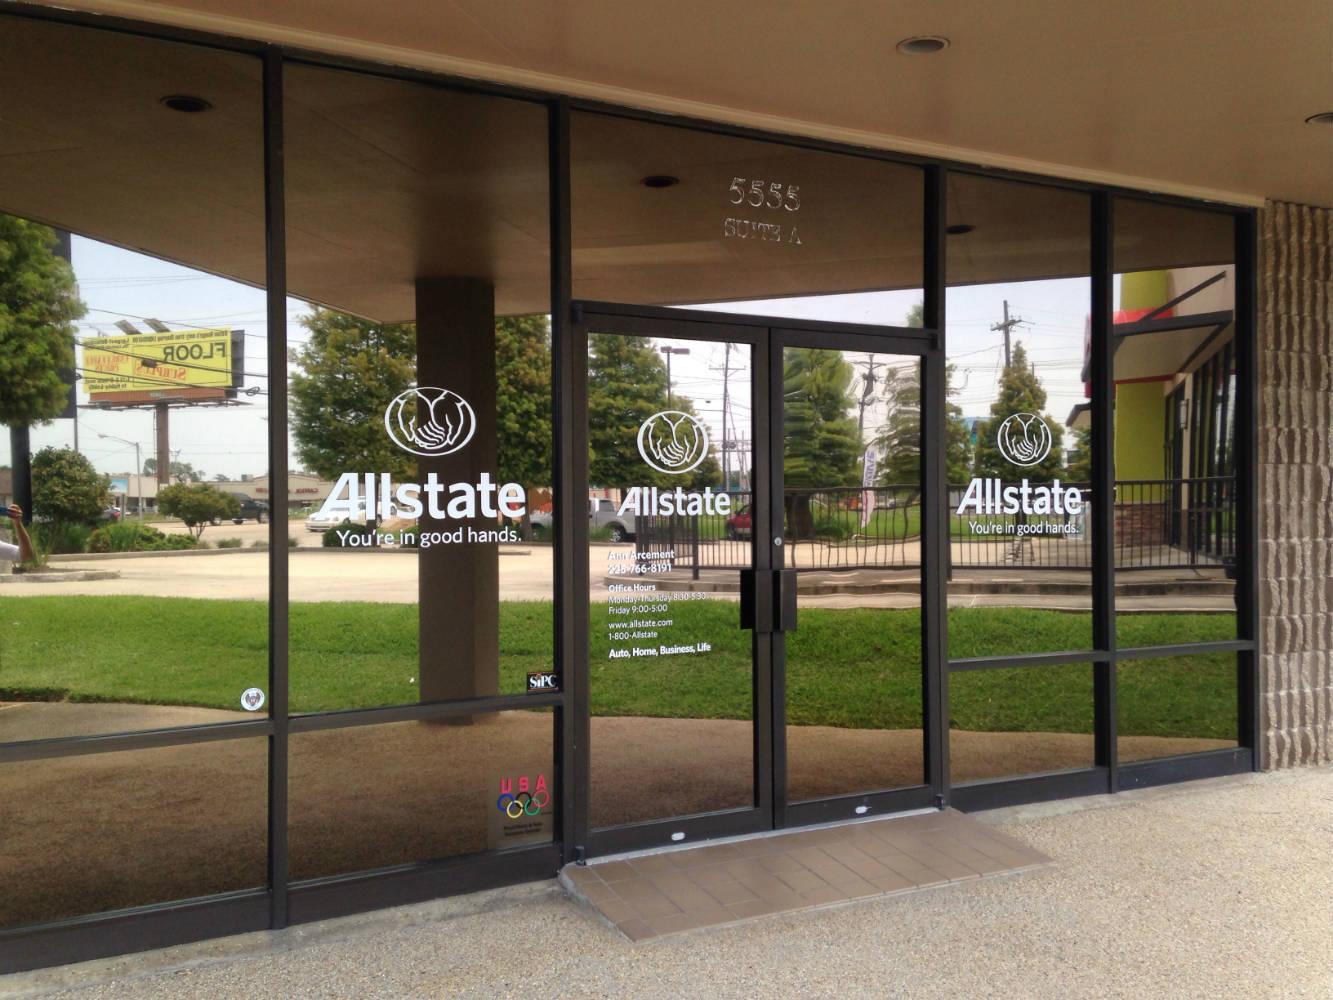 Ann Arcement: Allstate Insurance image 2